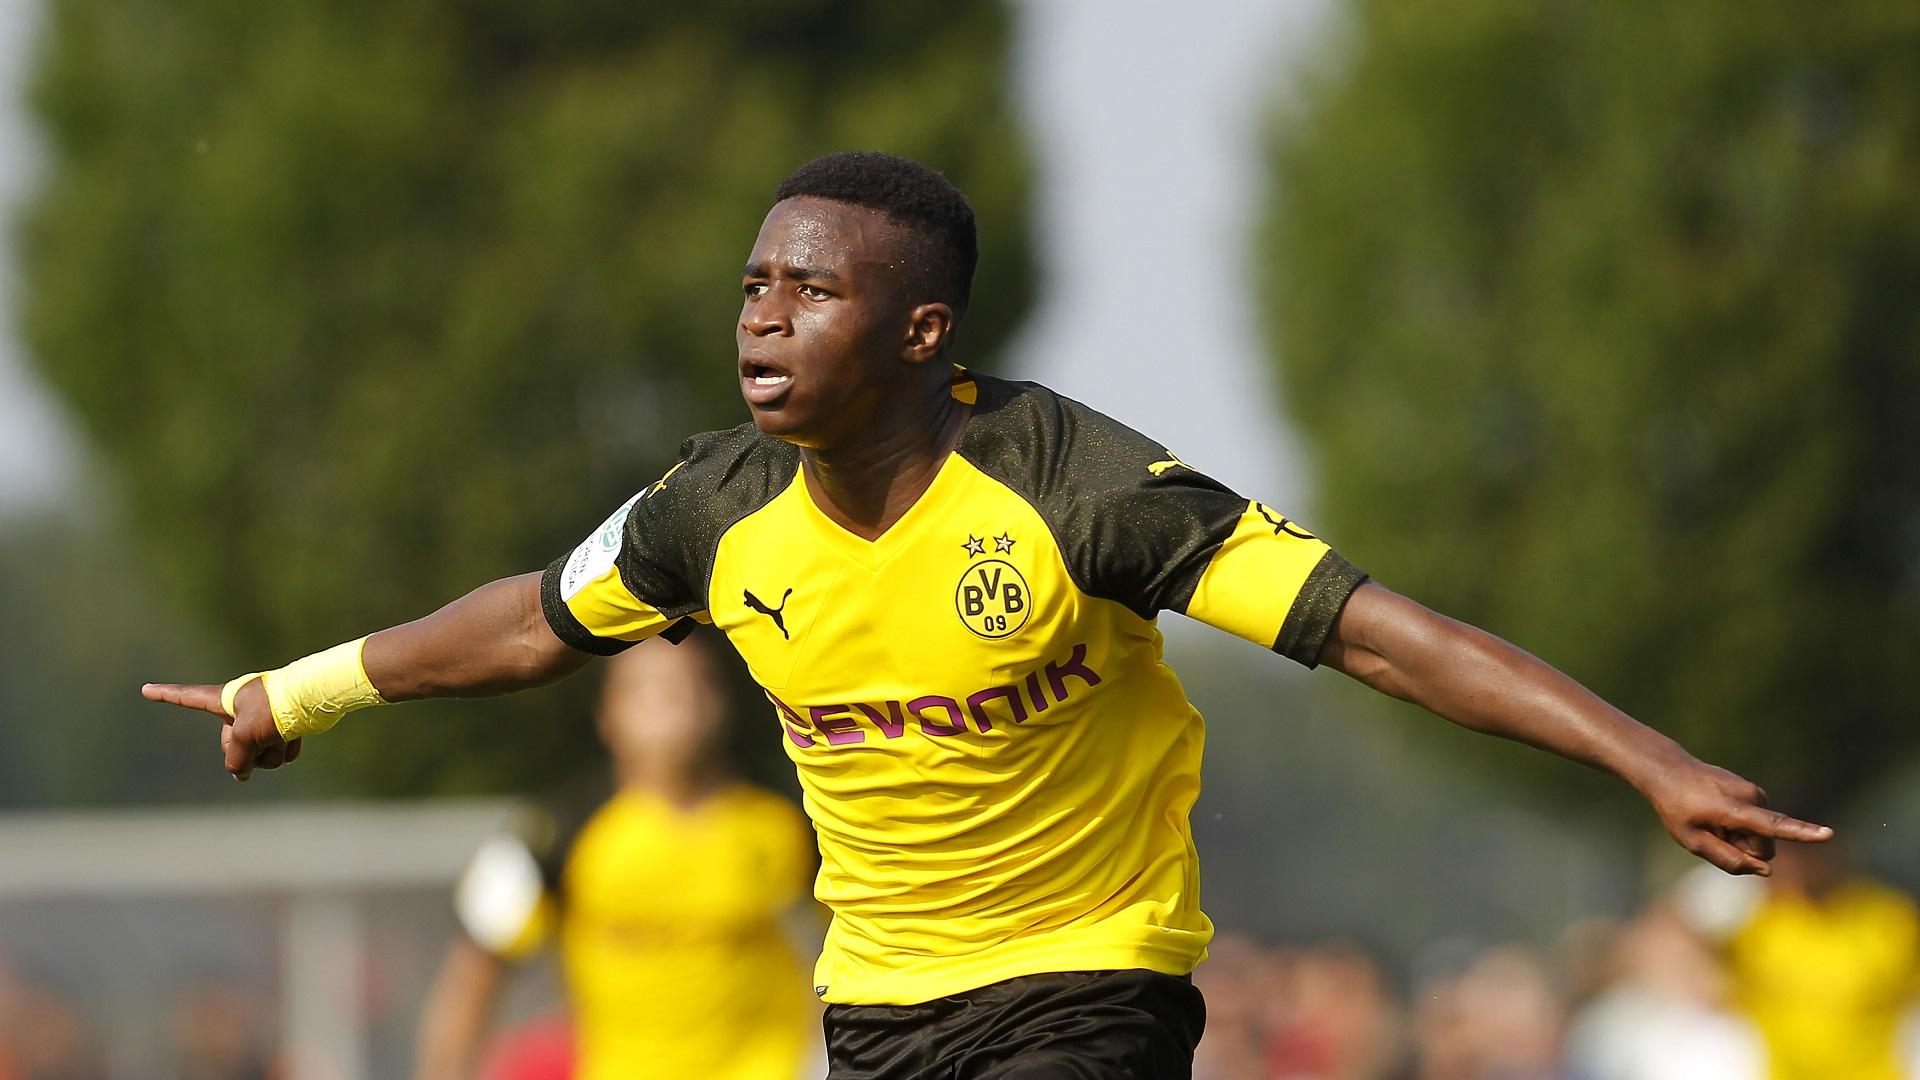 Youssoufa Moukoko Borussia Dortmund S 14 Year Old Wonderkid Driving Germany Crazy After Six Goal Debut Haul Goal Com